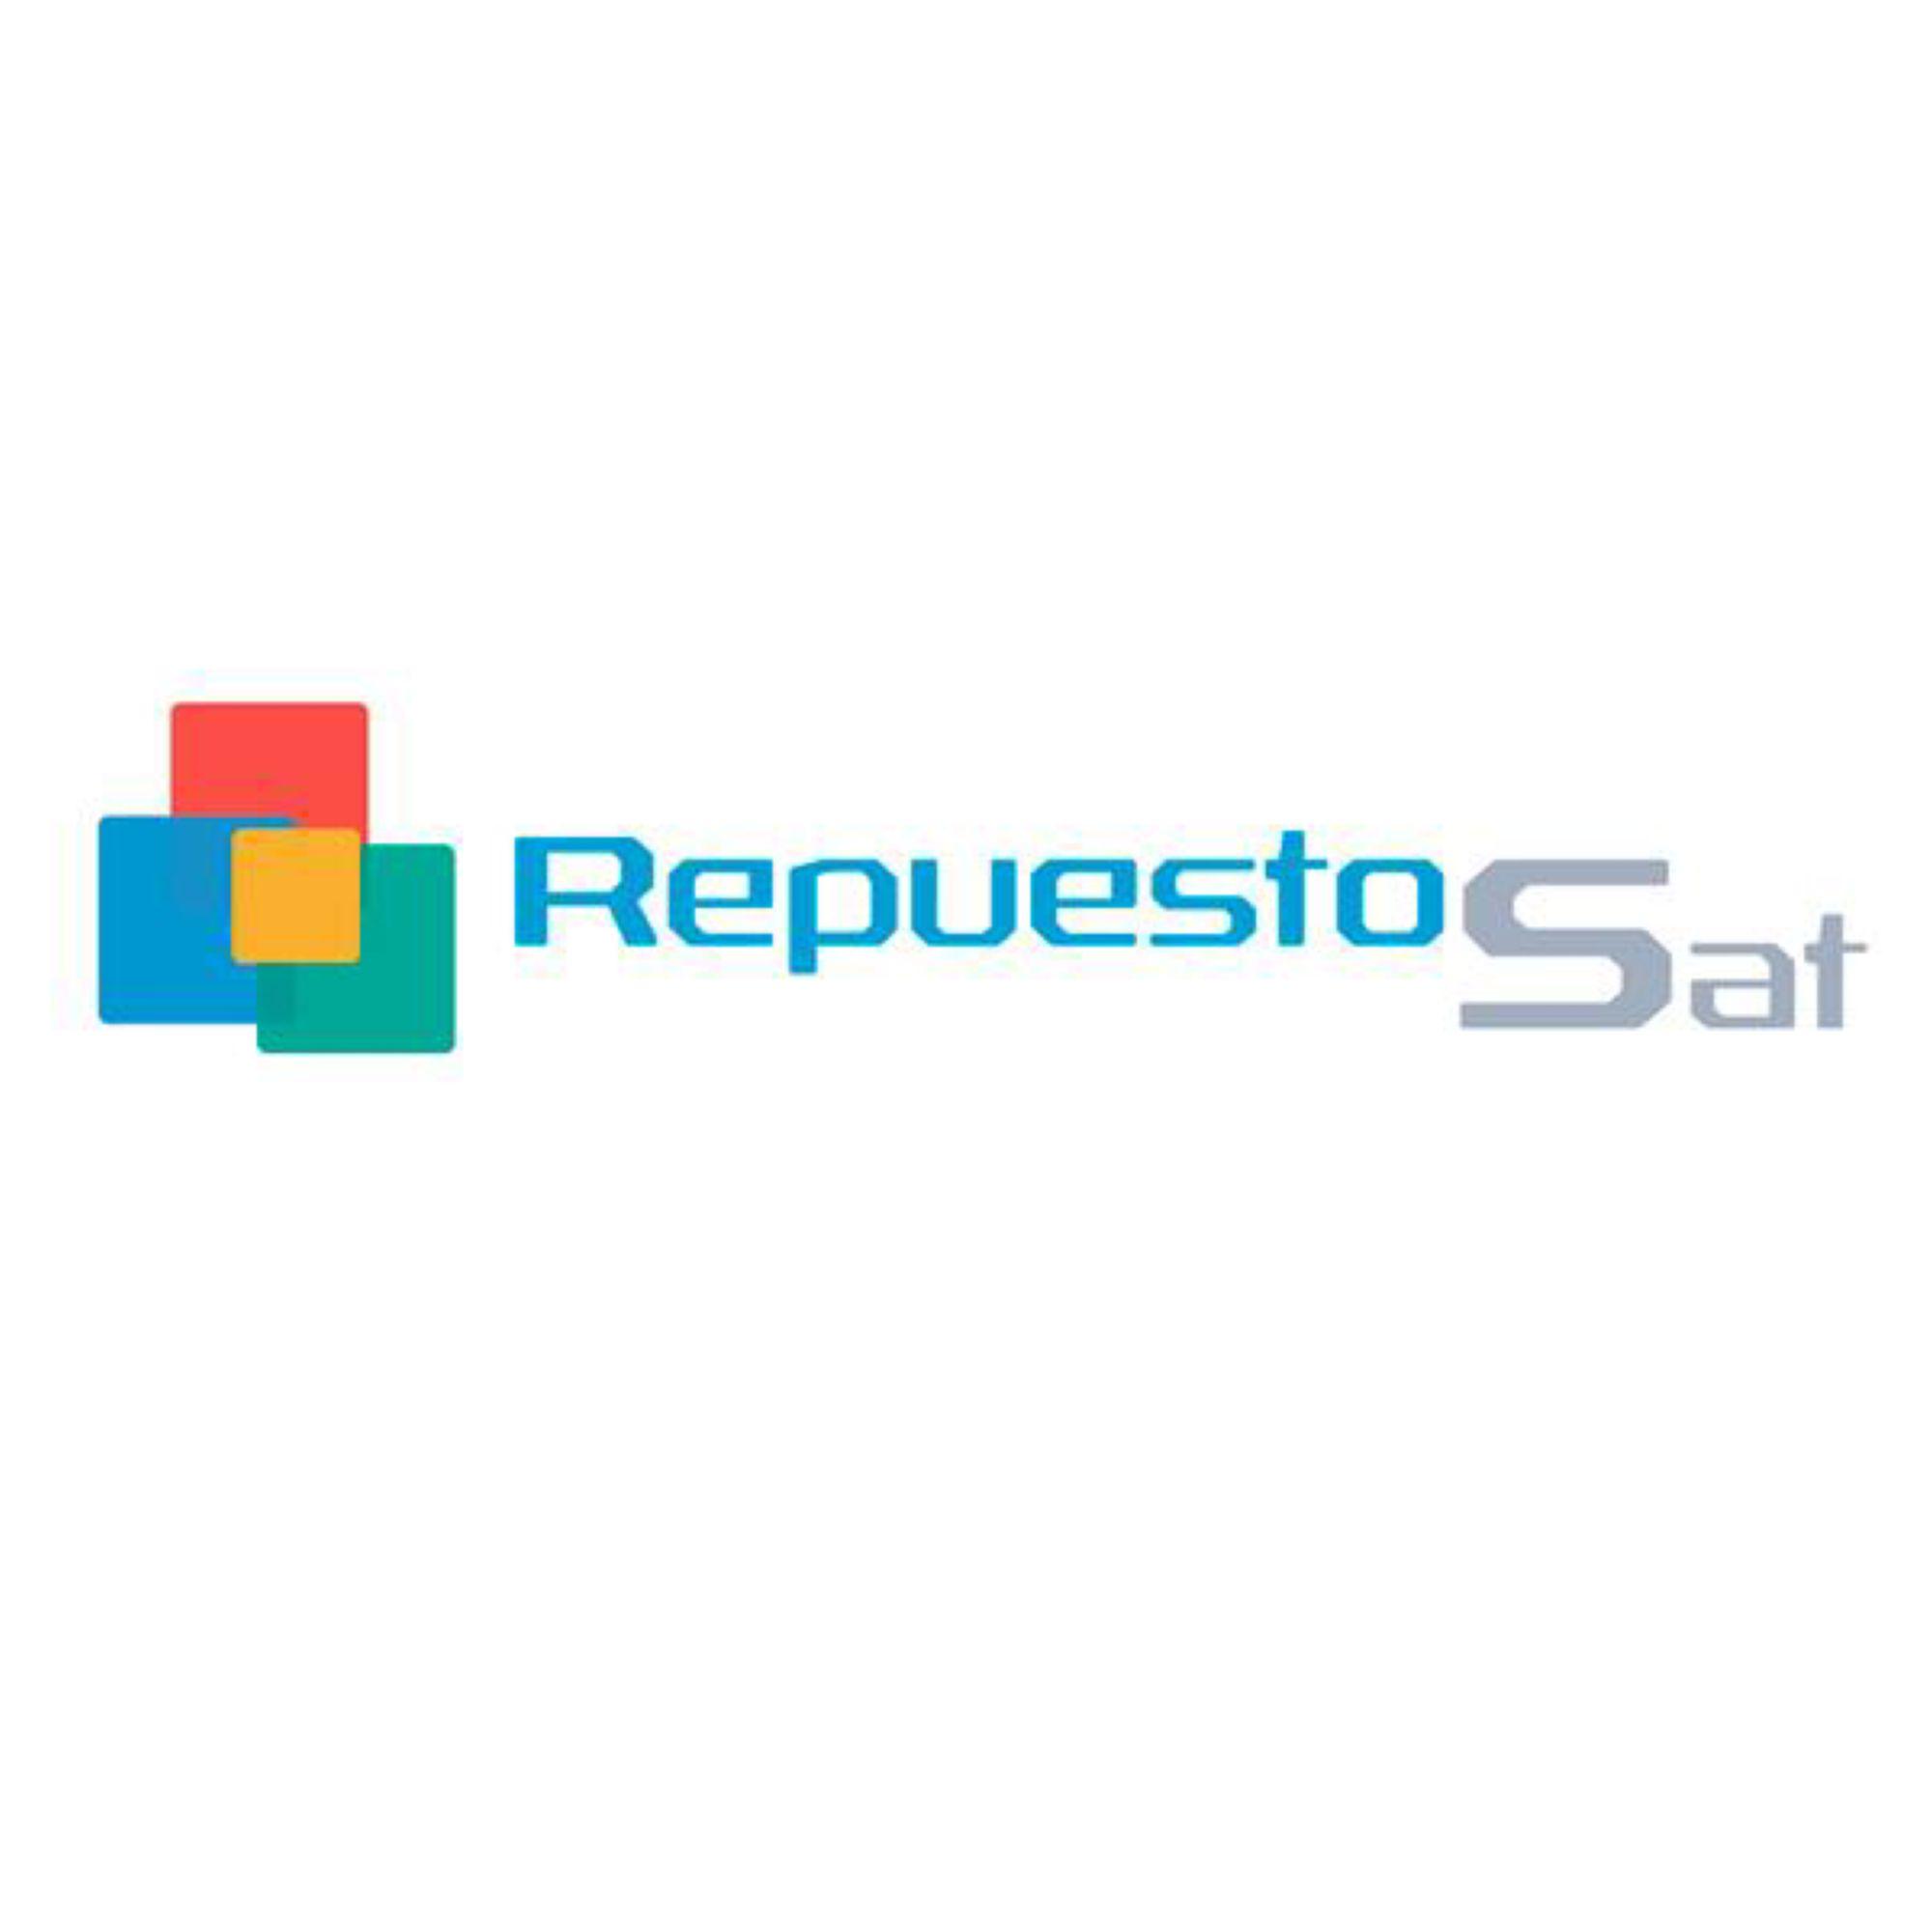 Imag-ES-testo-distri-repuestossat-600x600.jpg